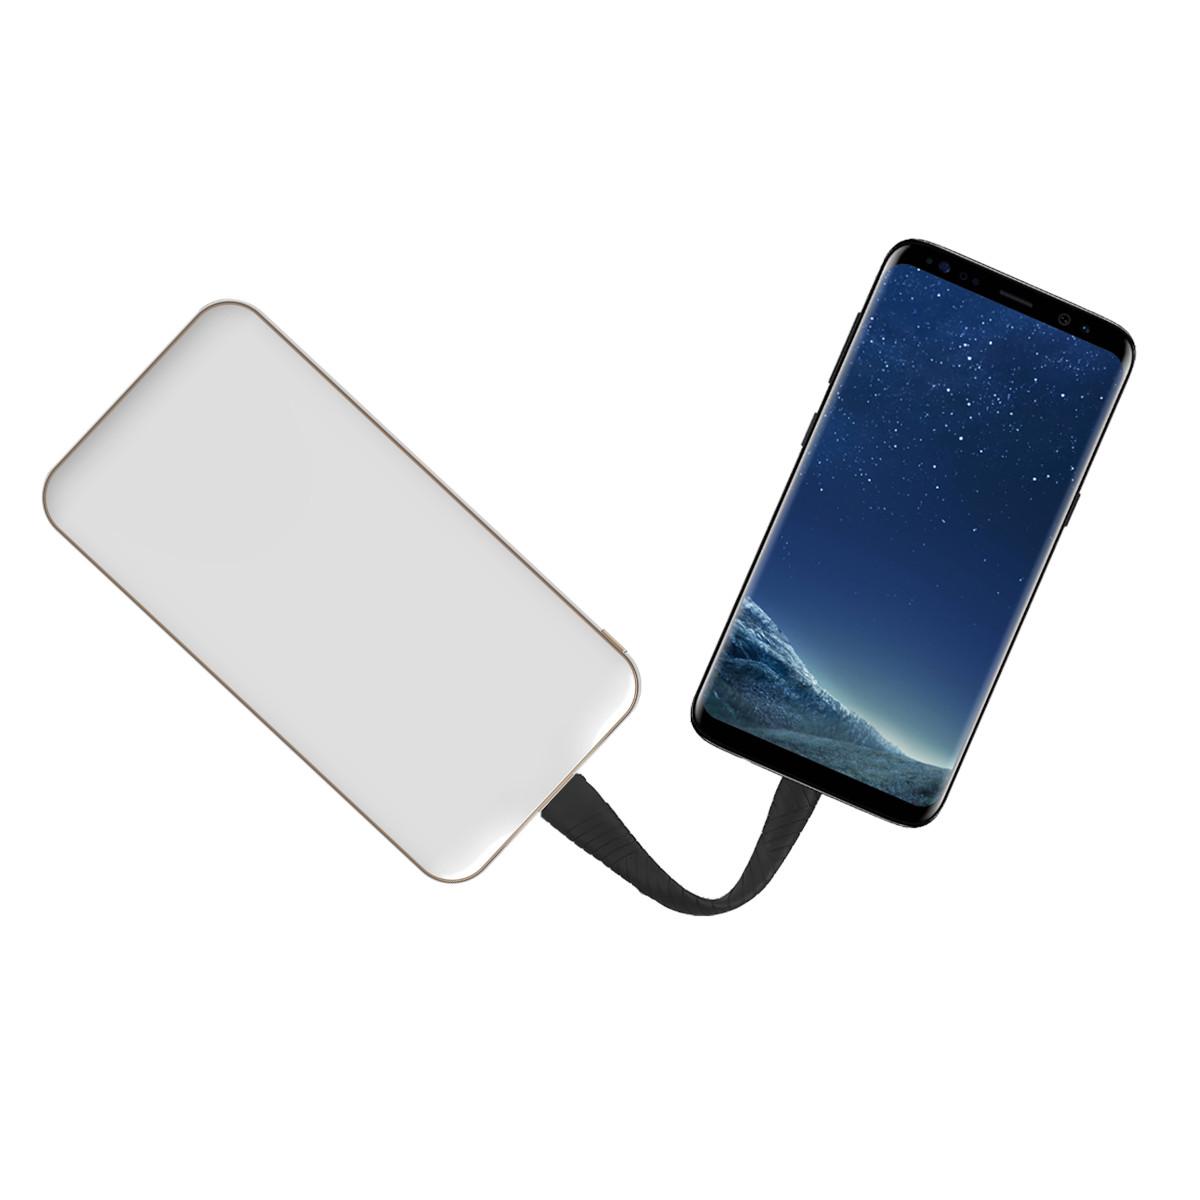 Cabo USB-C curto - 12cm